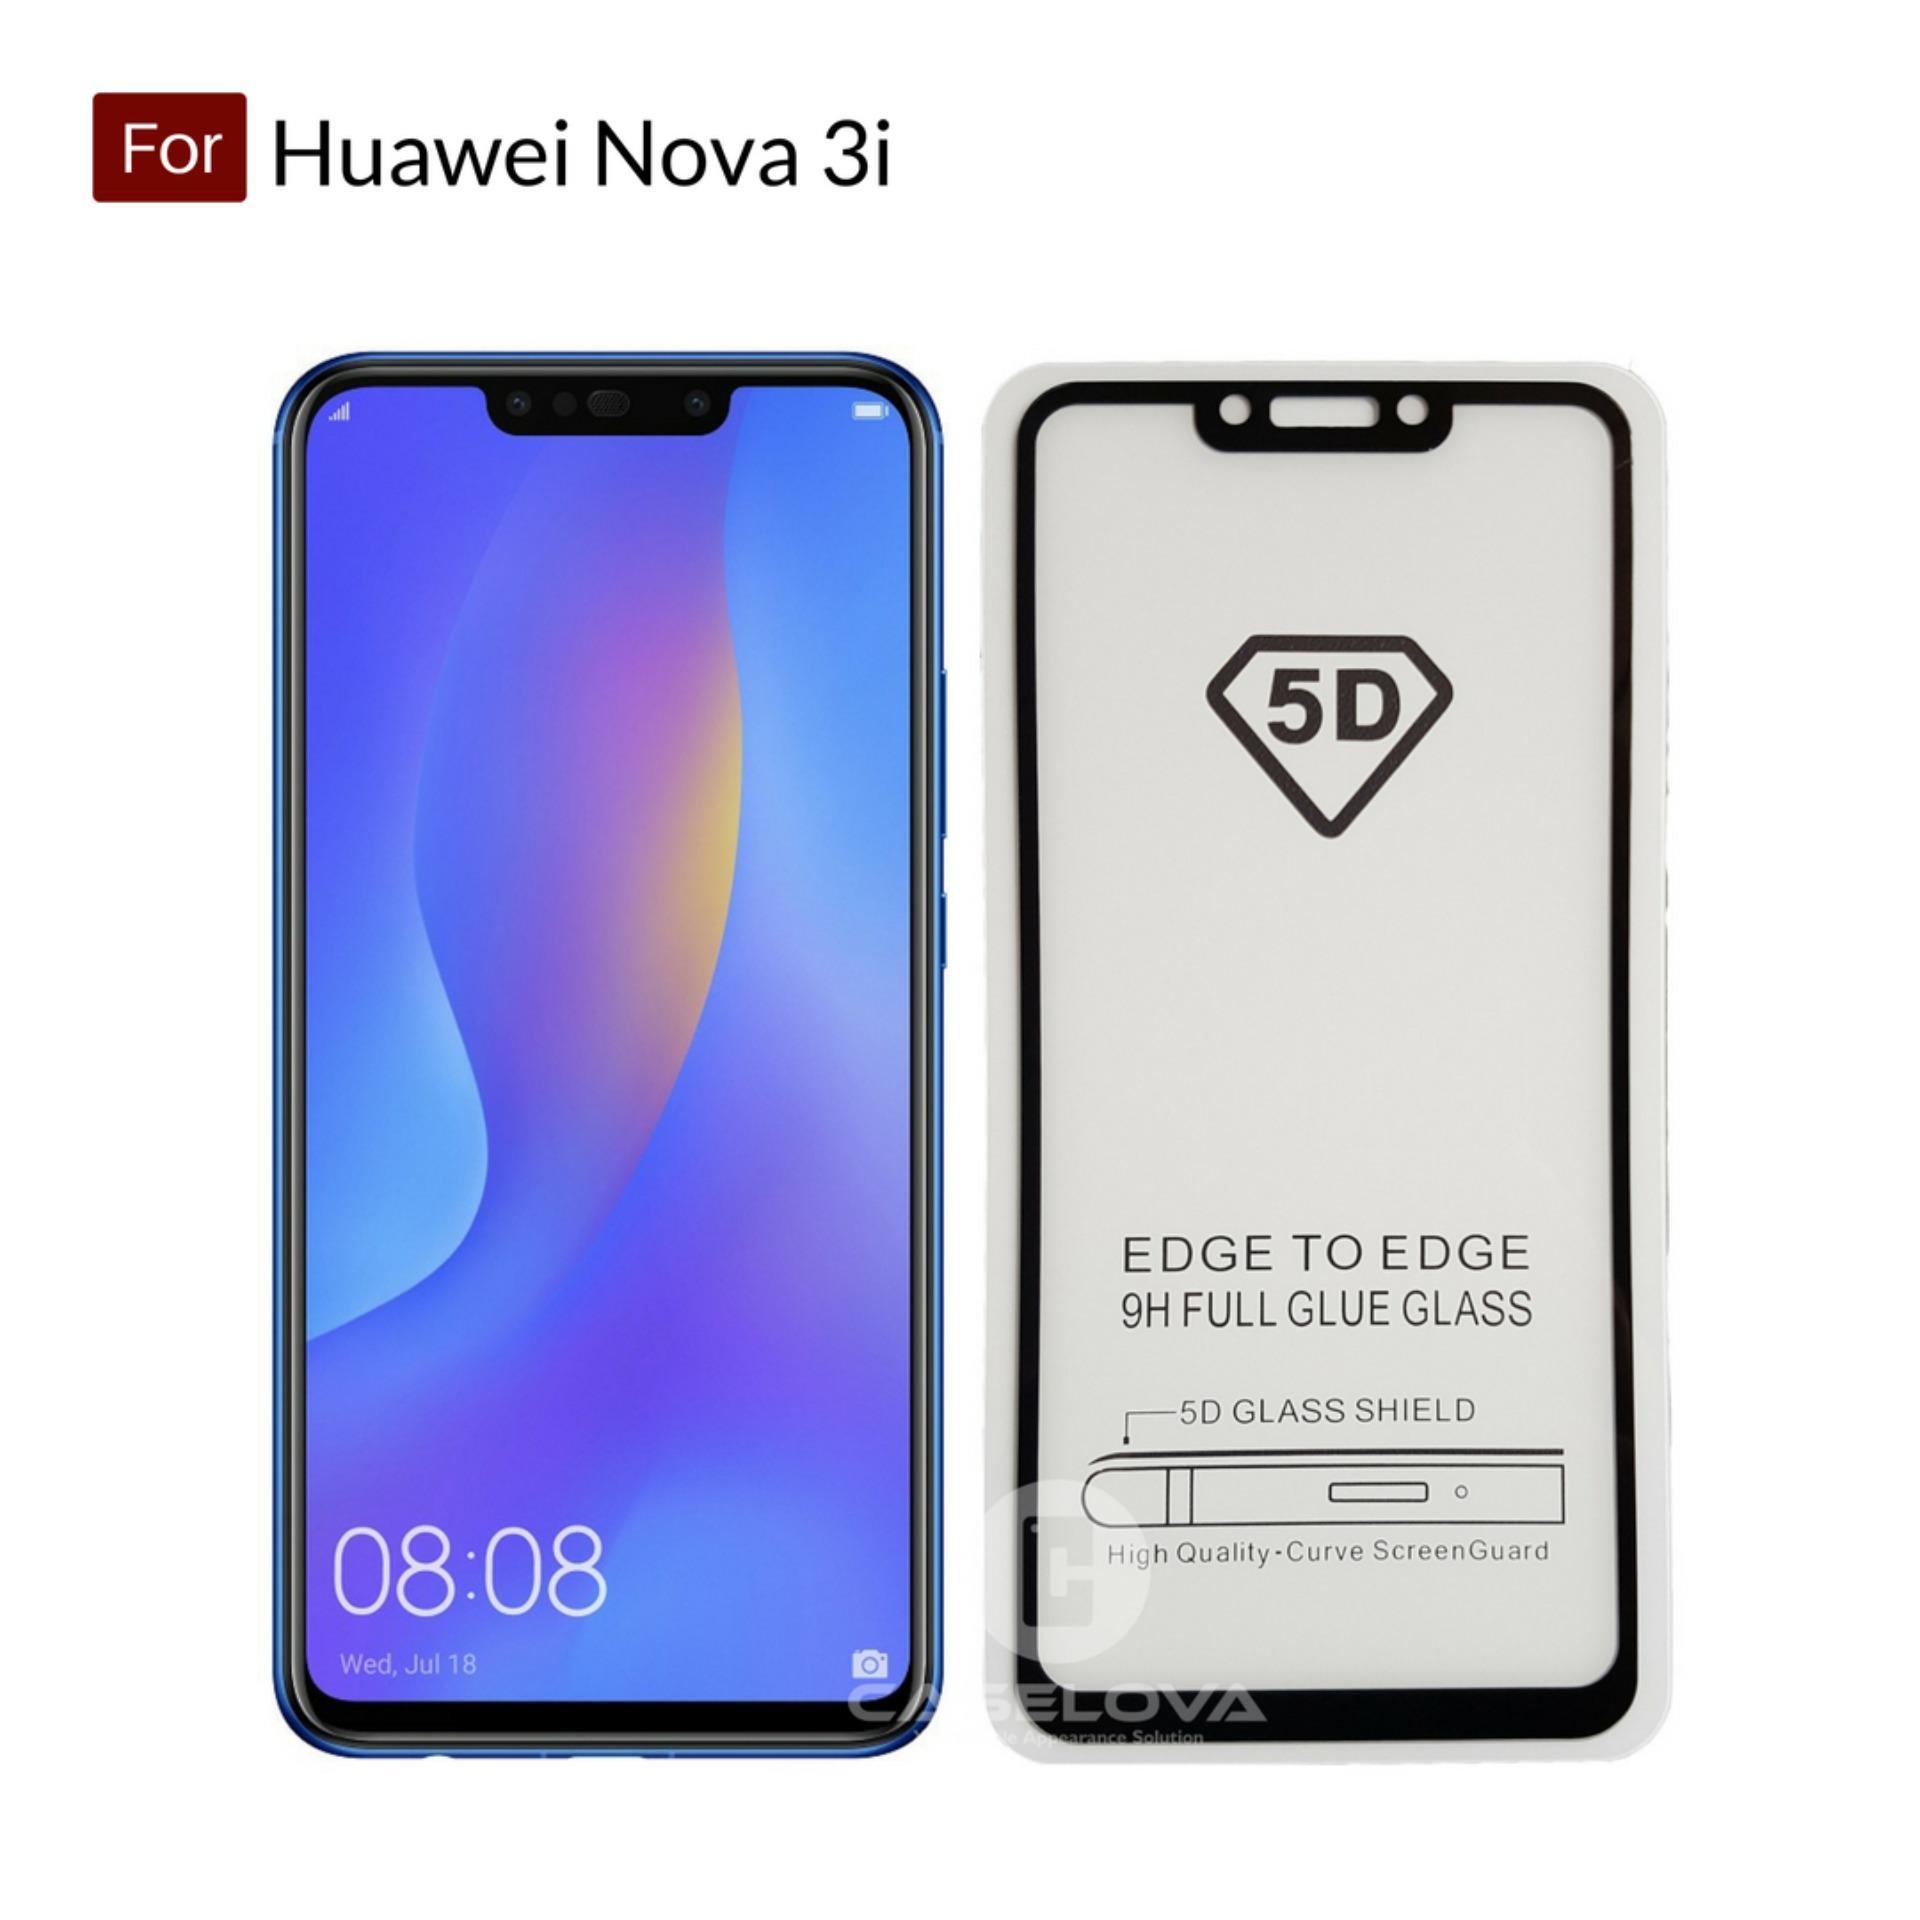 Caselova Premium Full Cover Tempered Glass 5D Round Curved Edge For Huawei Nova 3i - Black